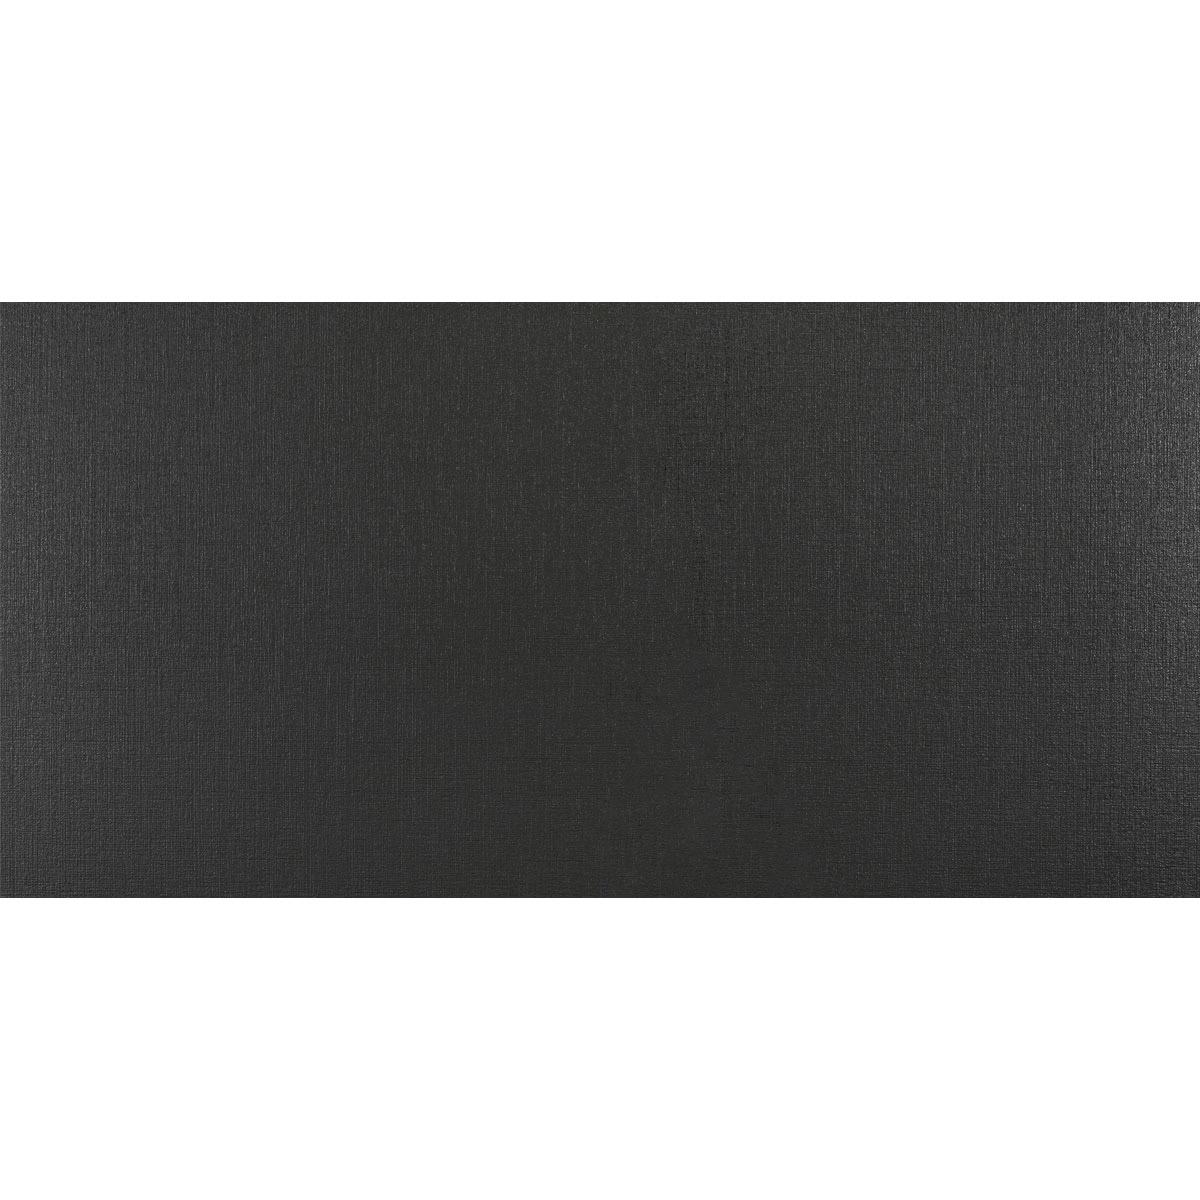 COSMOPOLITAN BLACK FLOOR TILE P1